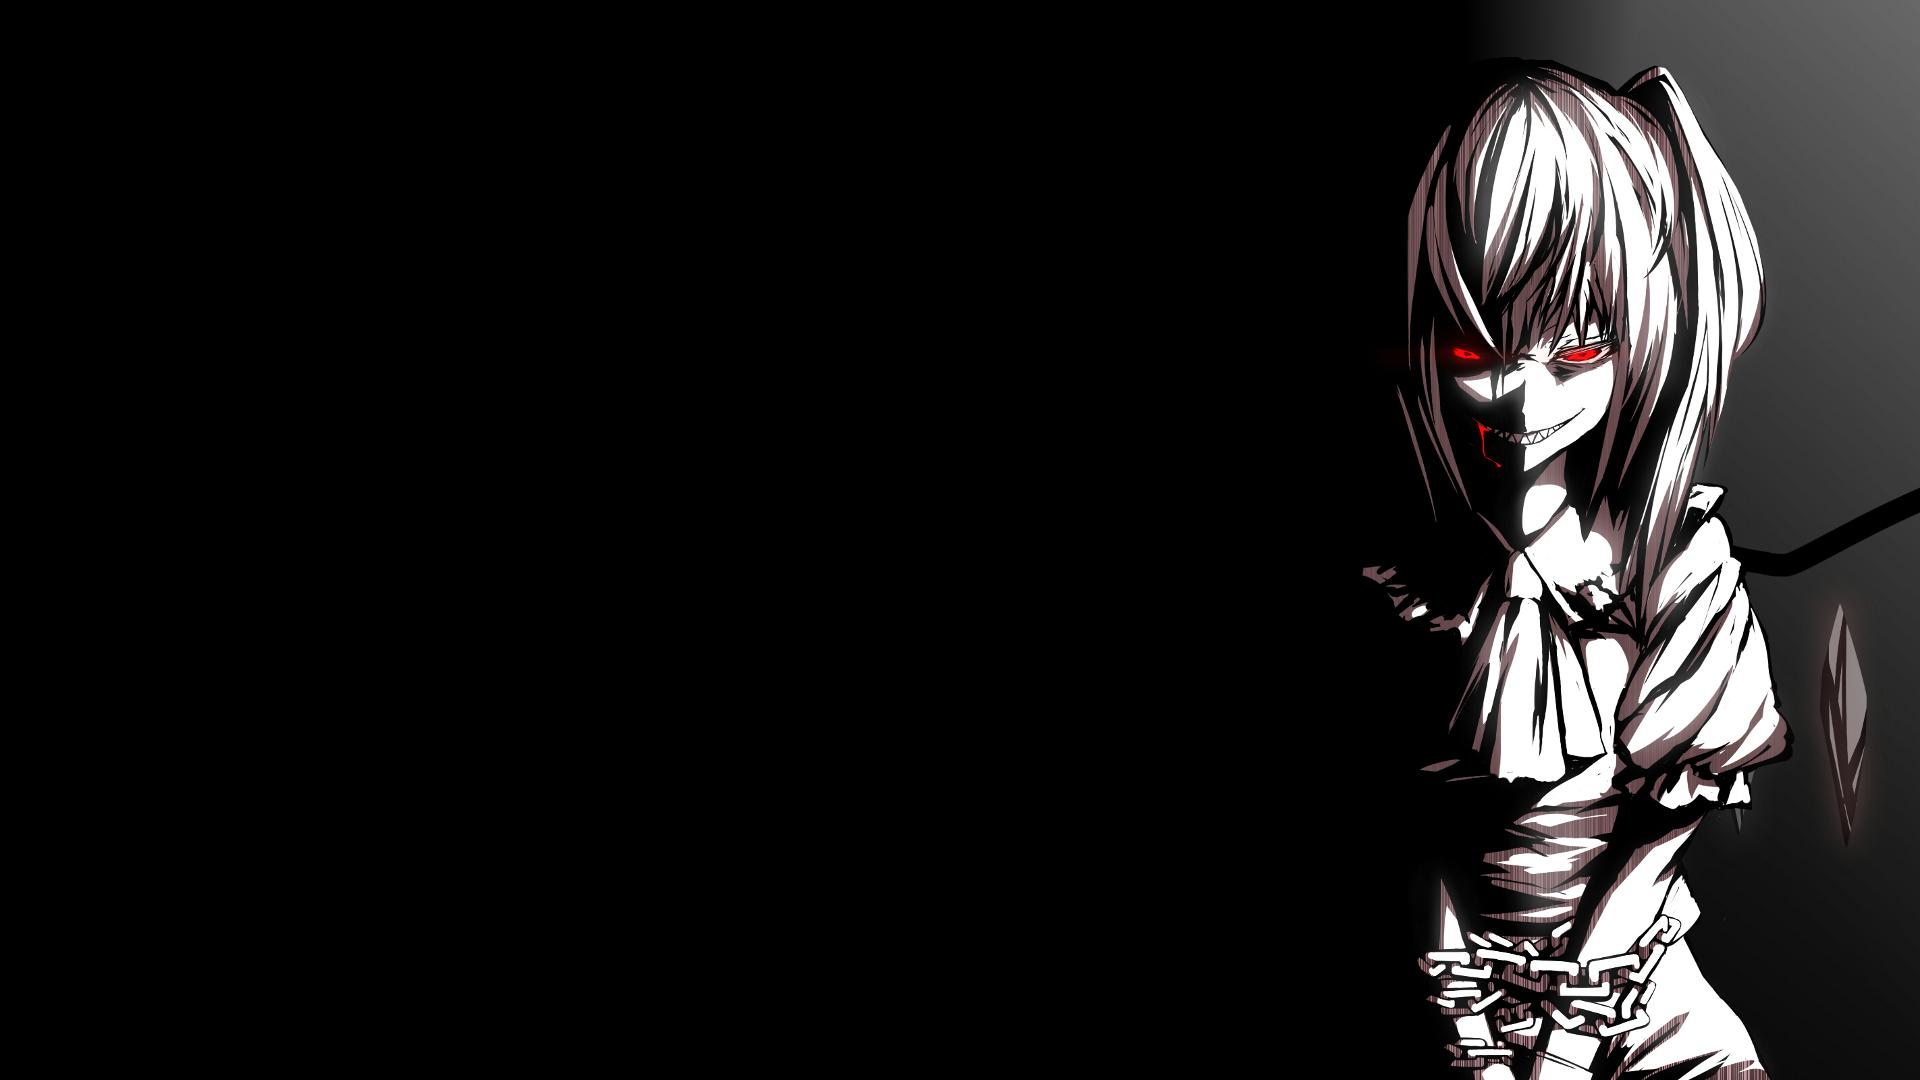 Anime Wallpaper Horor Animasi Gambar Anime